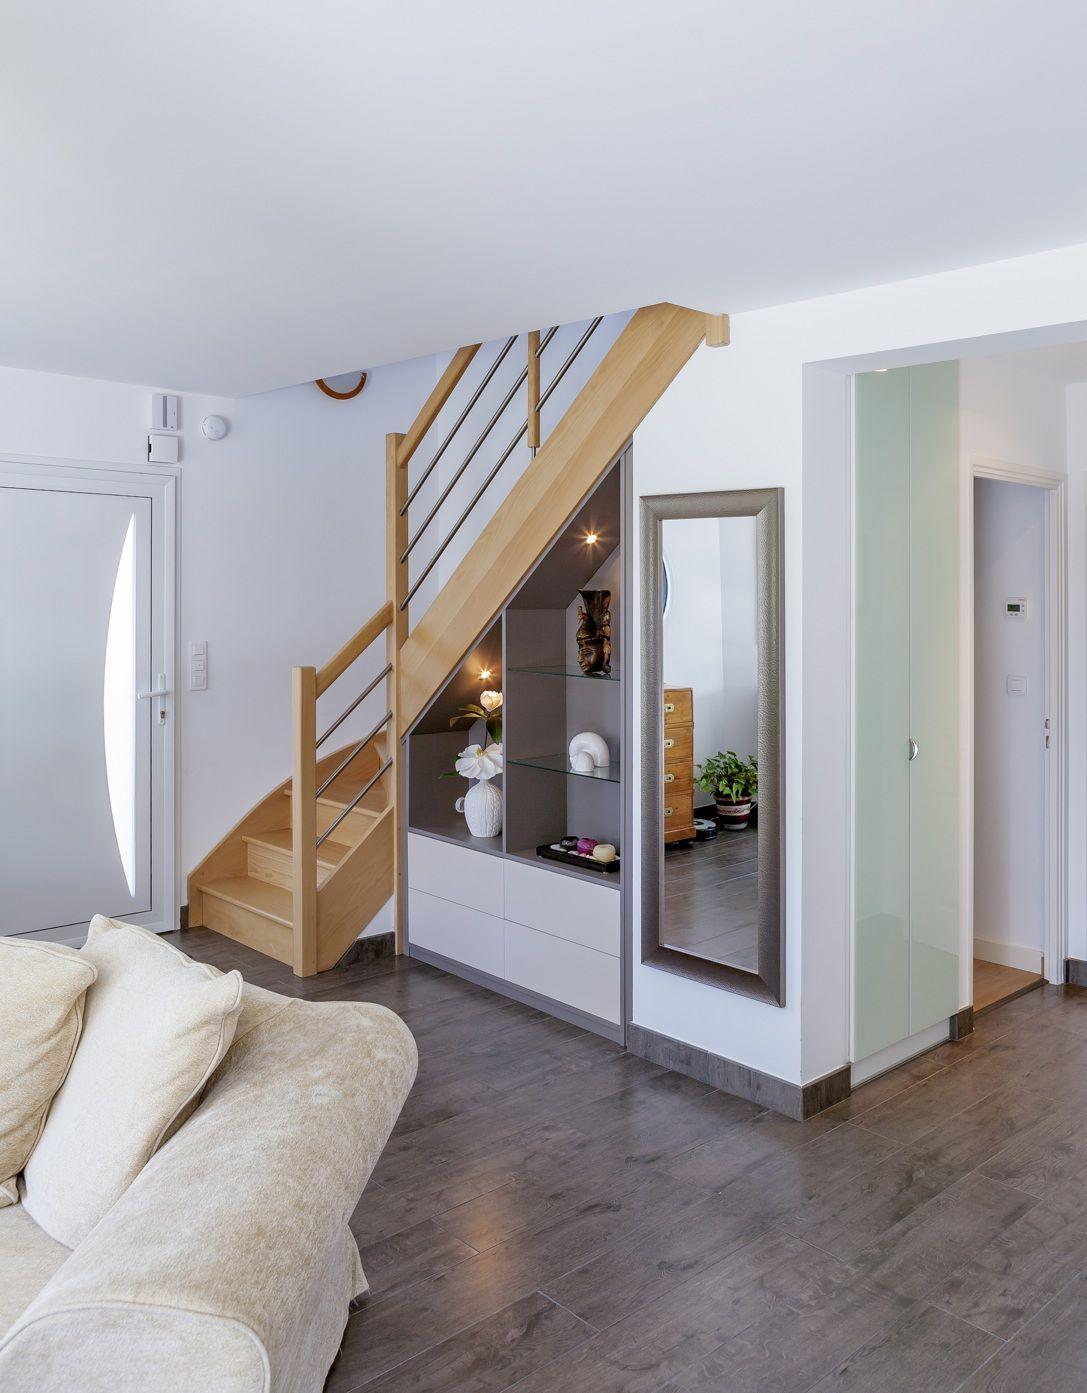 Entree Maison Meuble Sous Escalier Sous Escalier Placard Design